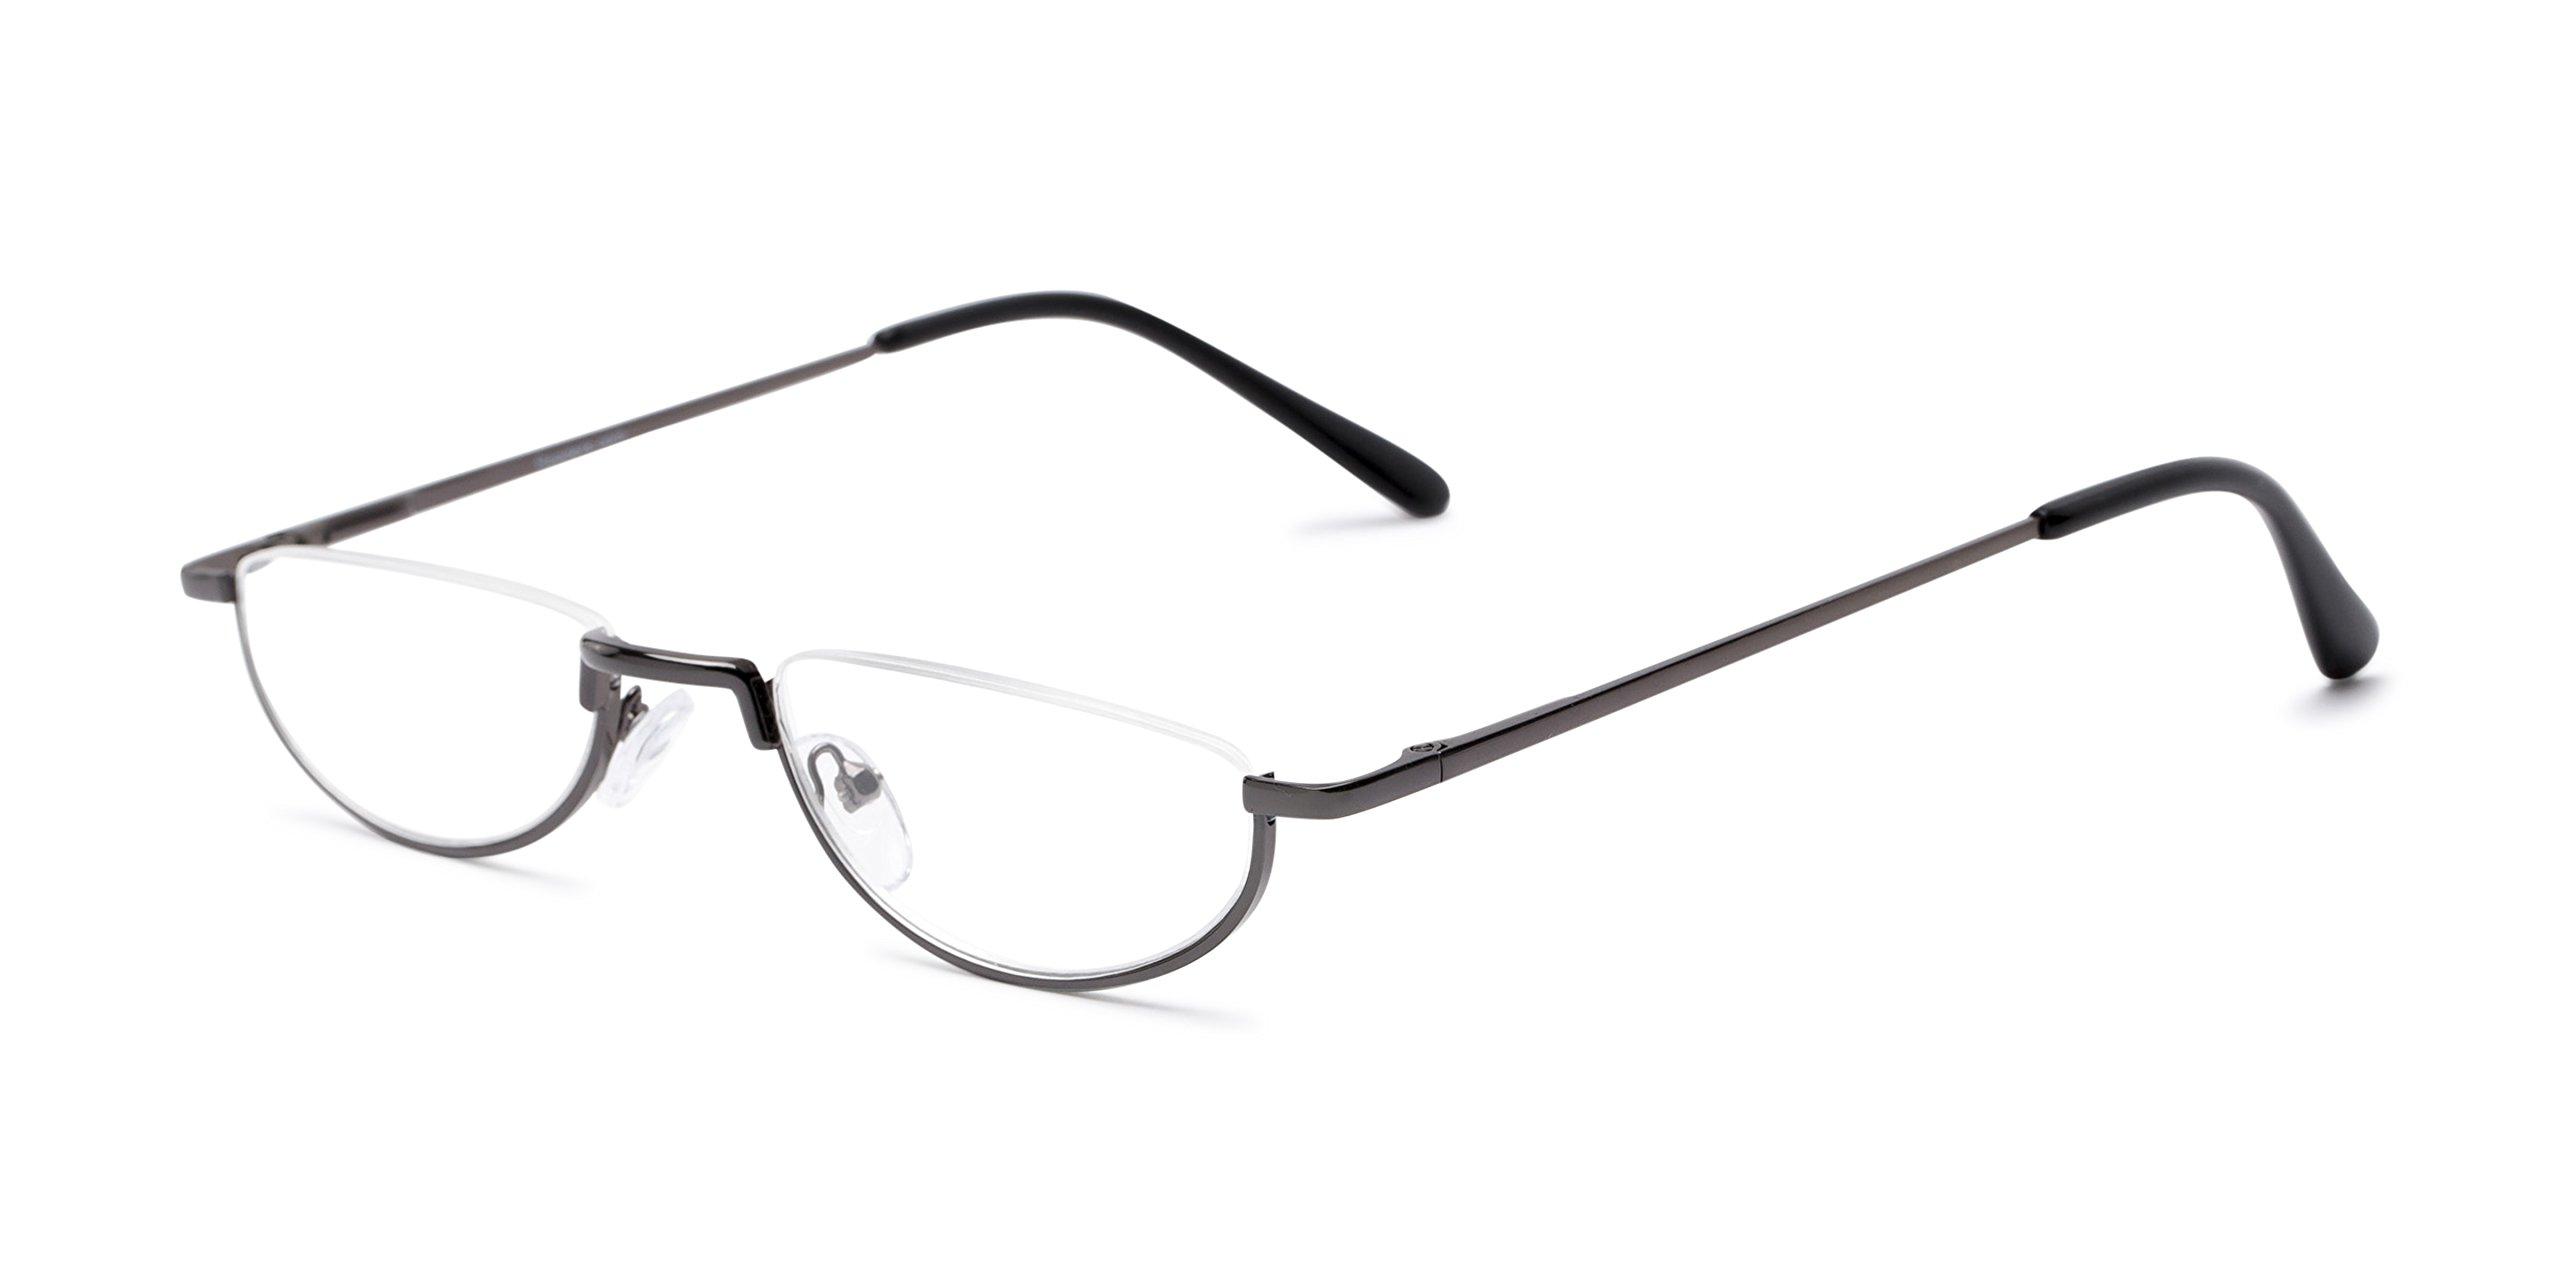 The Lynwood +1.50 Grey Reading Glasses